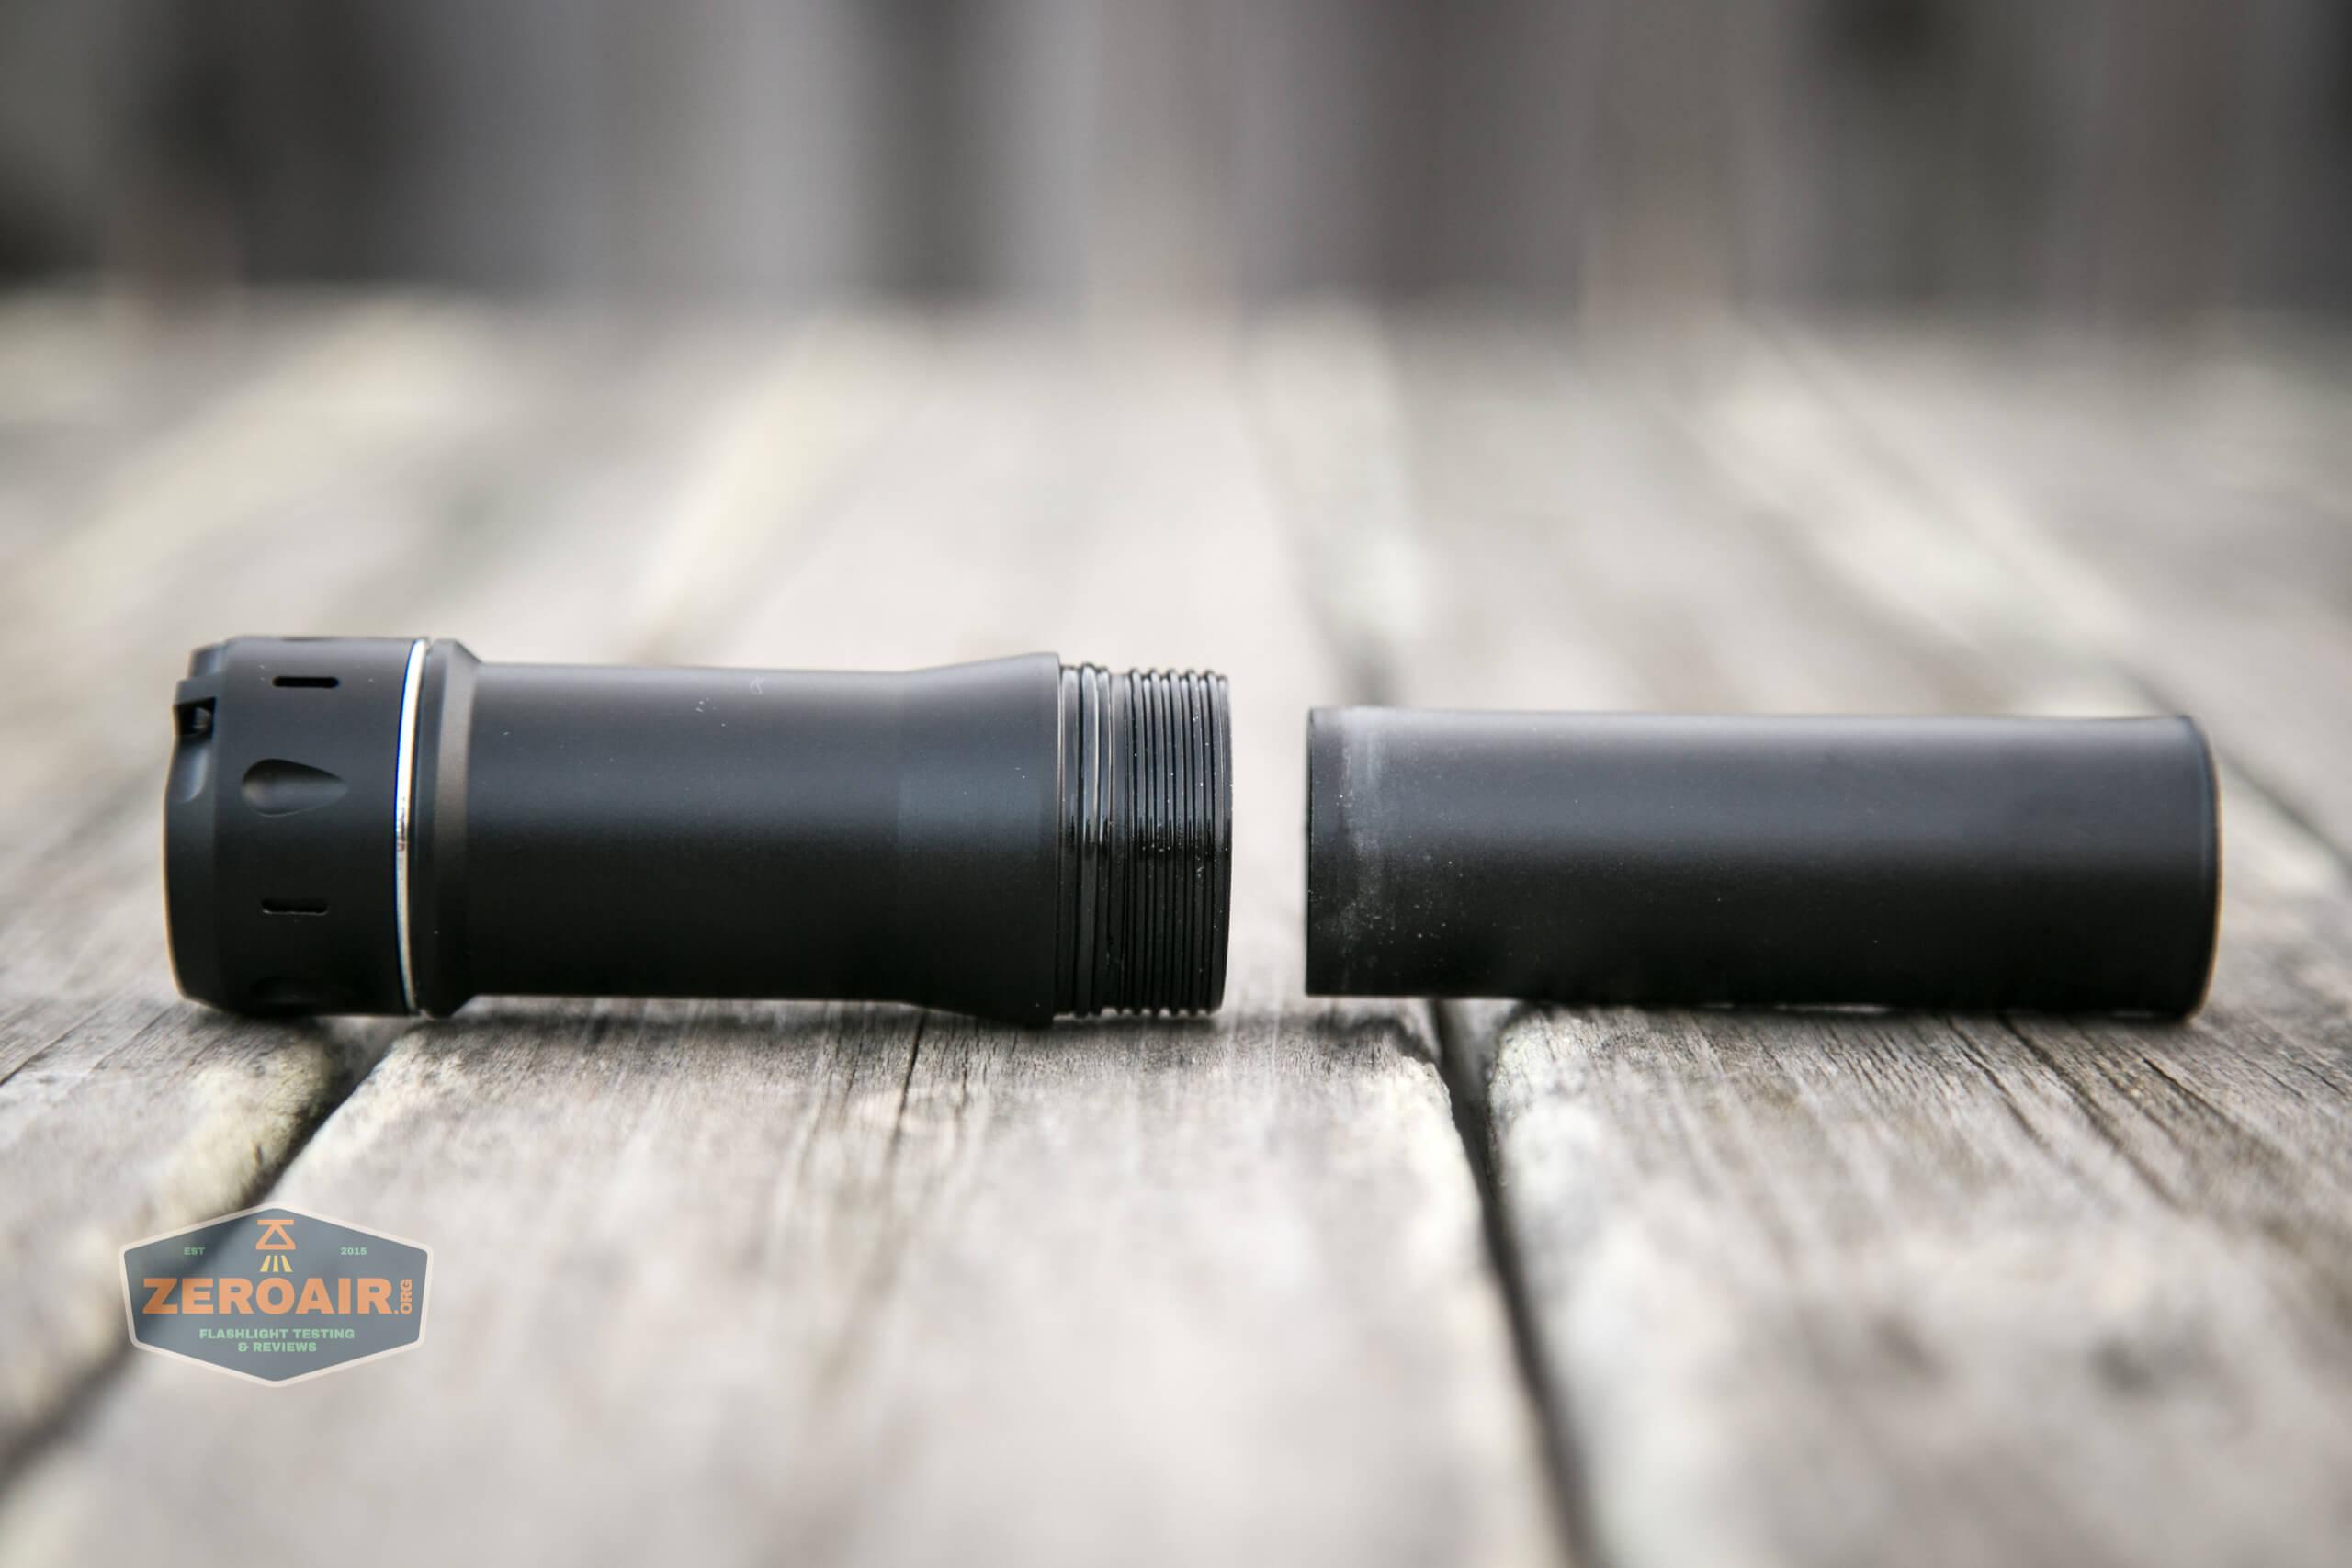 NlightD T90 luminus sbt-90.2 Andúril inner sleeve removed